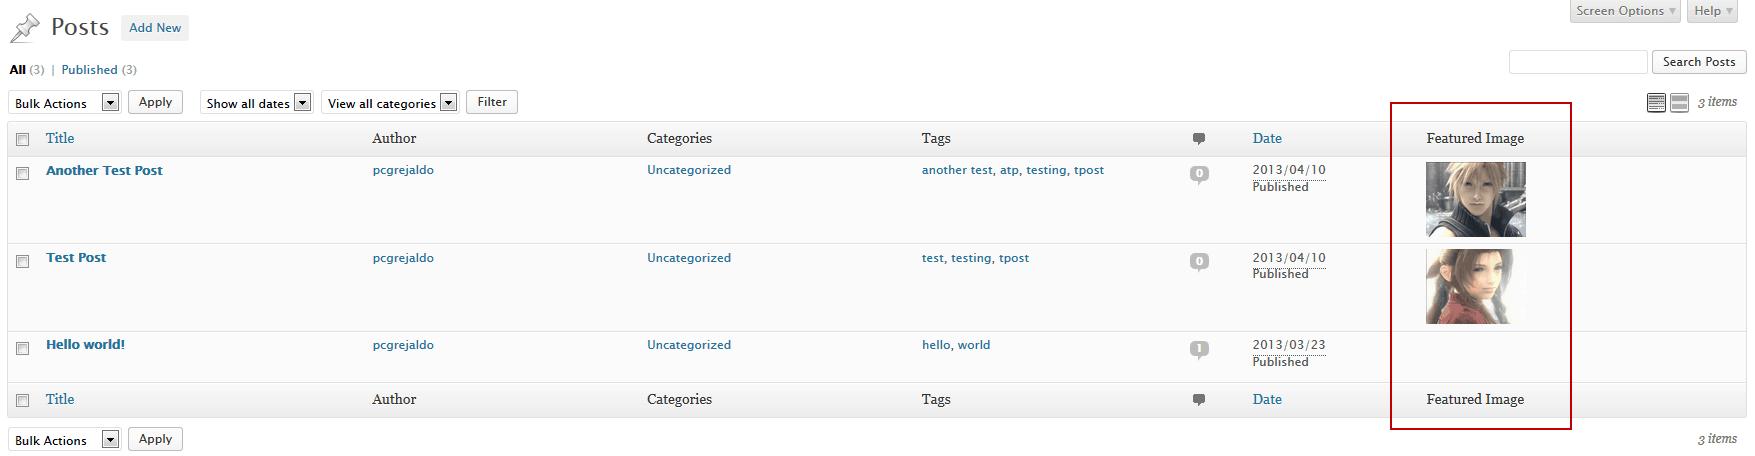 Wordpress - Agregar Columna de Imagen Destacada en listado de entradas 9